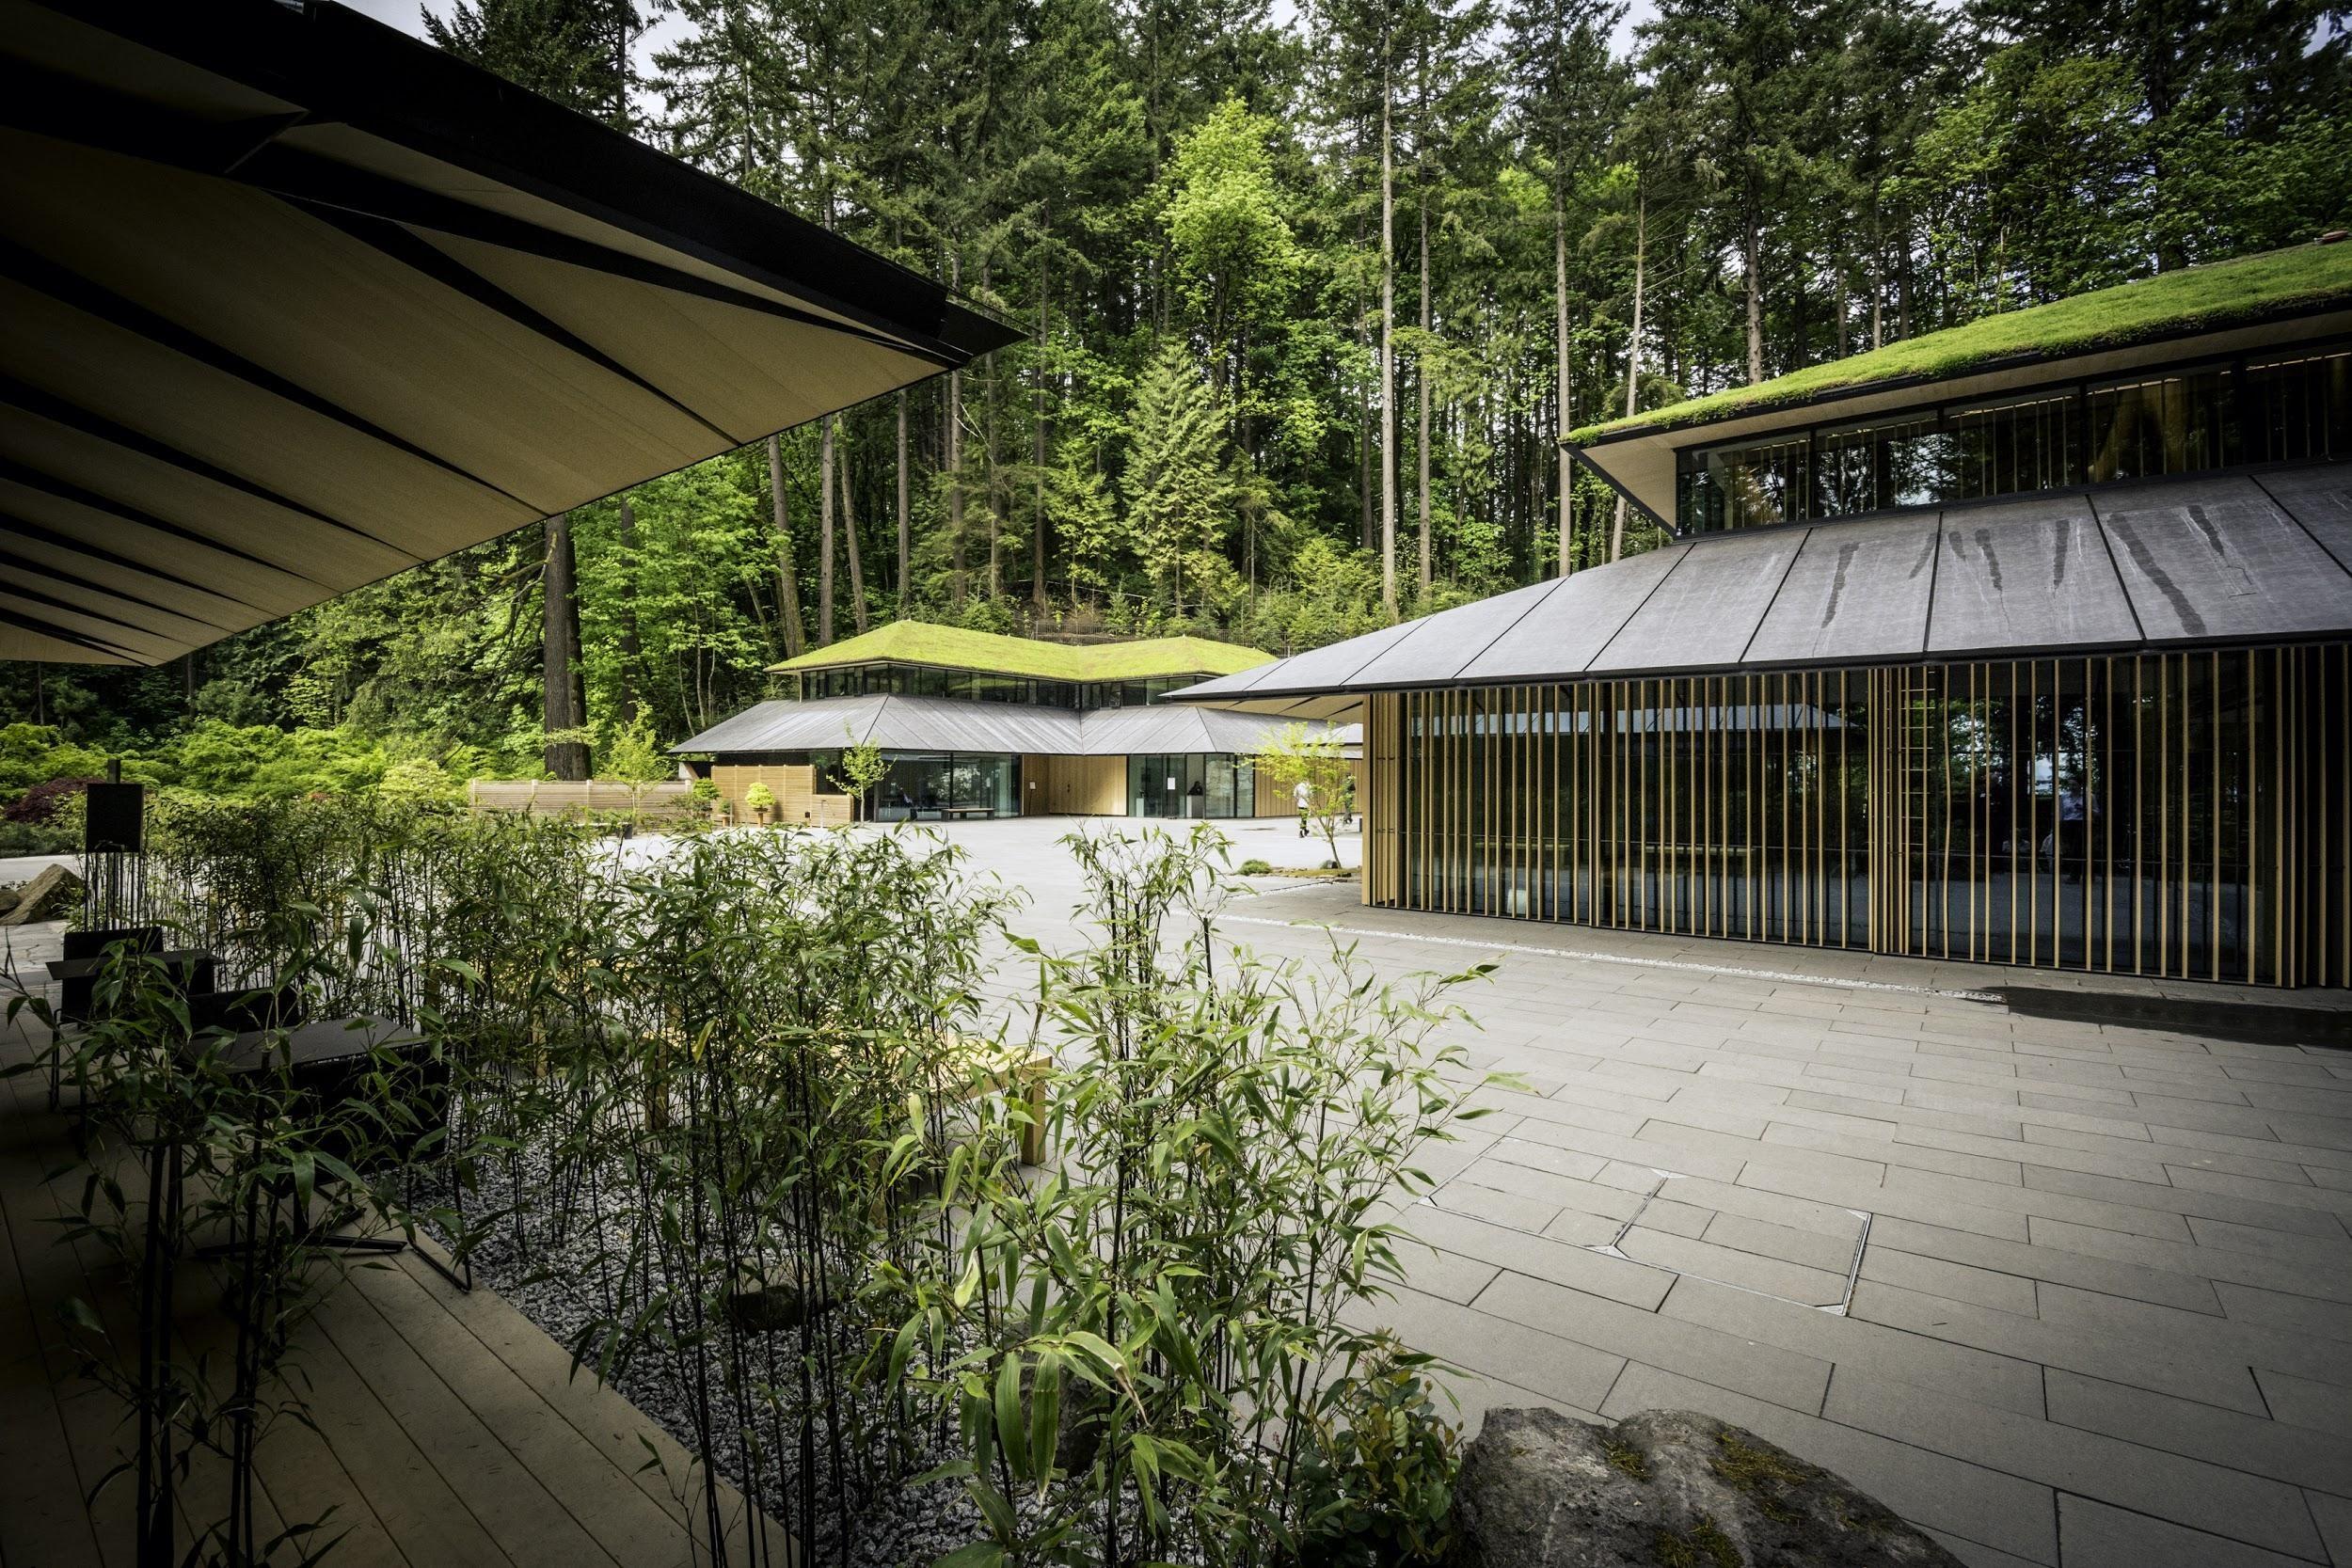 Pearlescent Metal Panels Strengthen Kengo Kuma's First U.S. Project